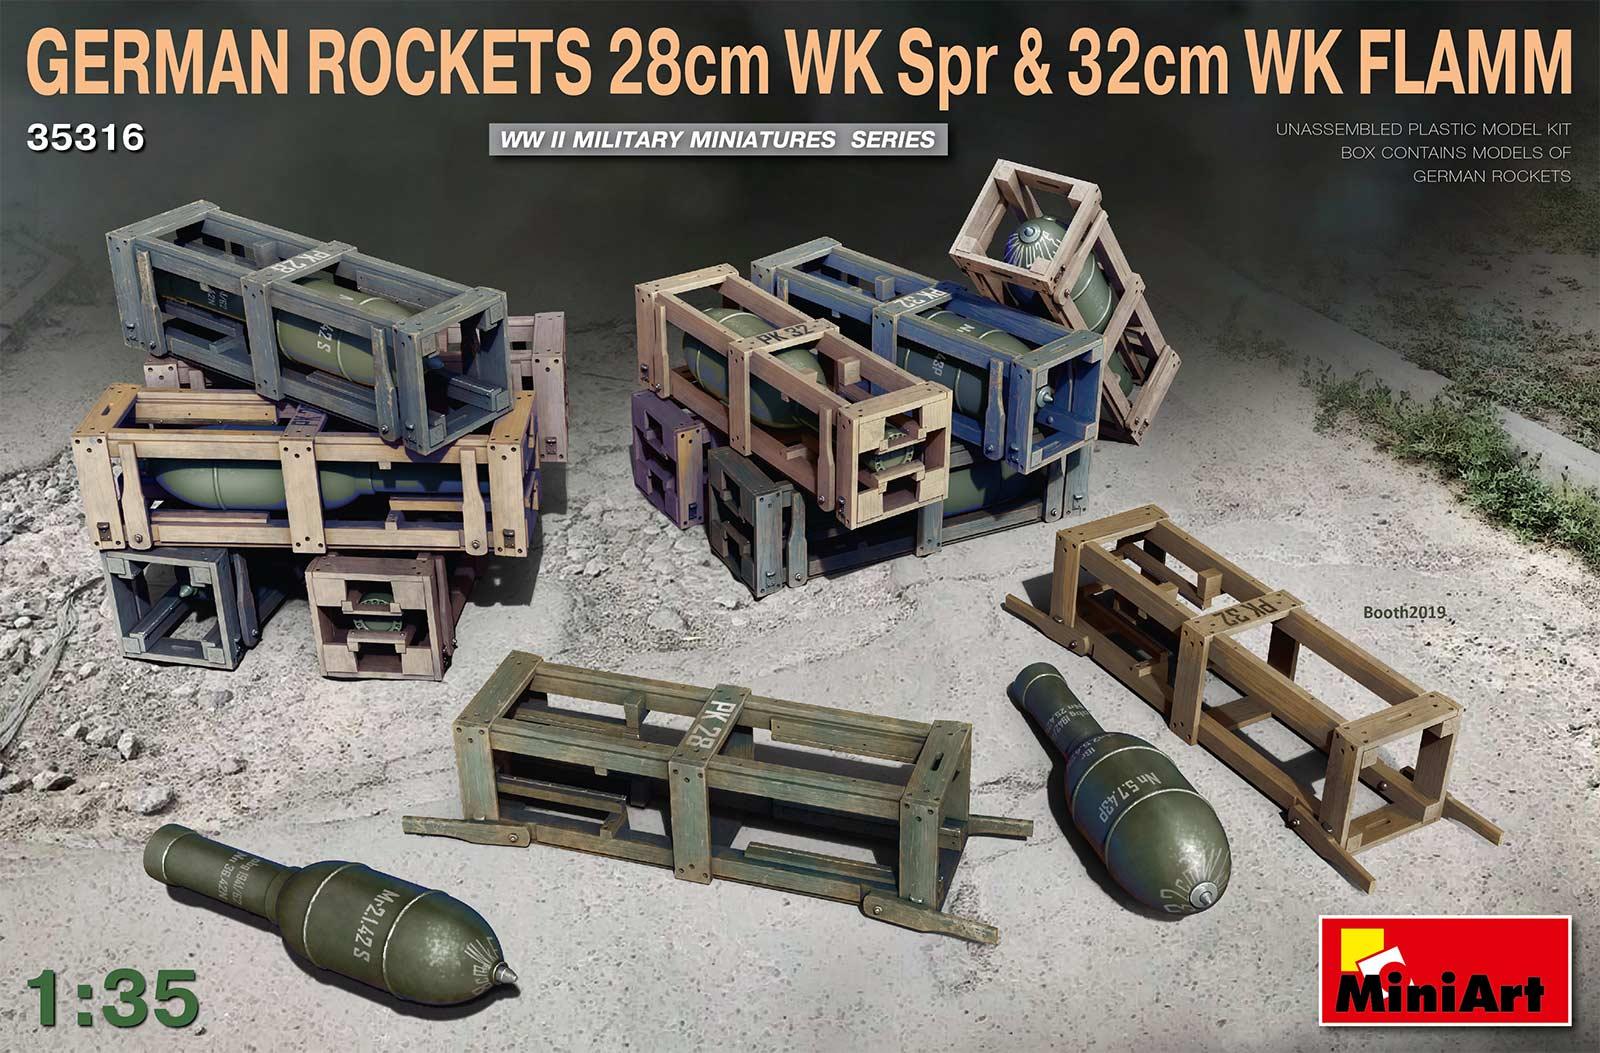 MiniArt 1/35 German Rockets 28cm WK Spr & 32cm WK Flamm